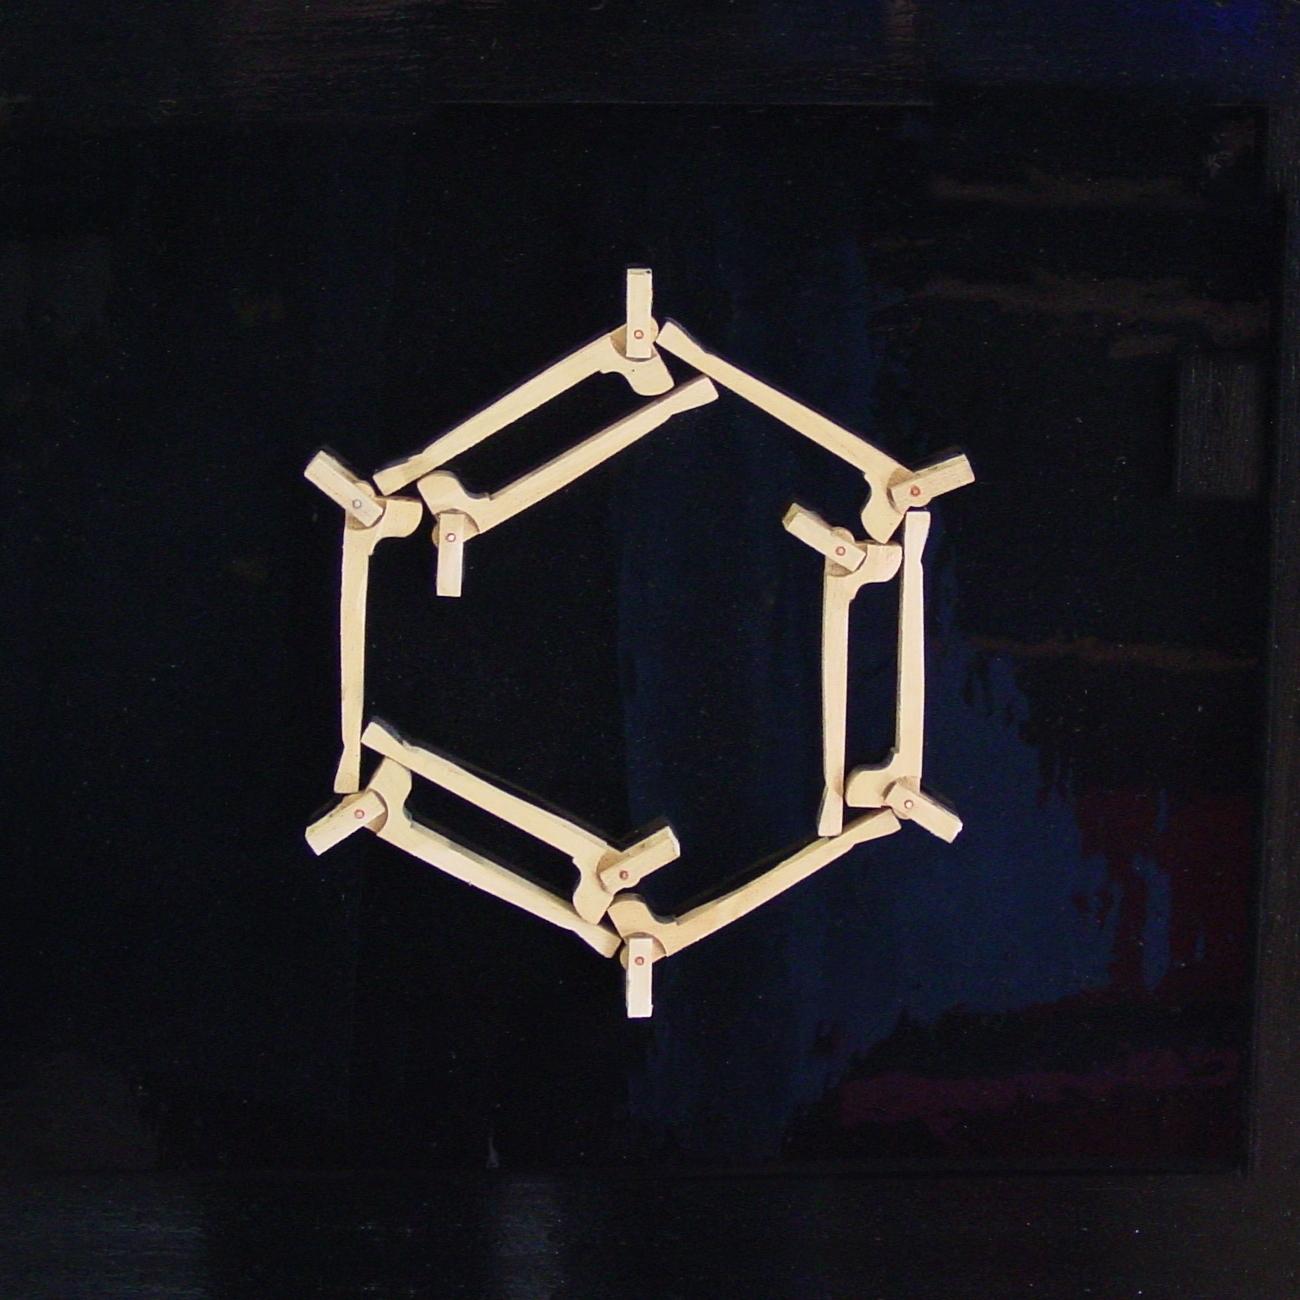 Benzolring